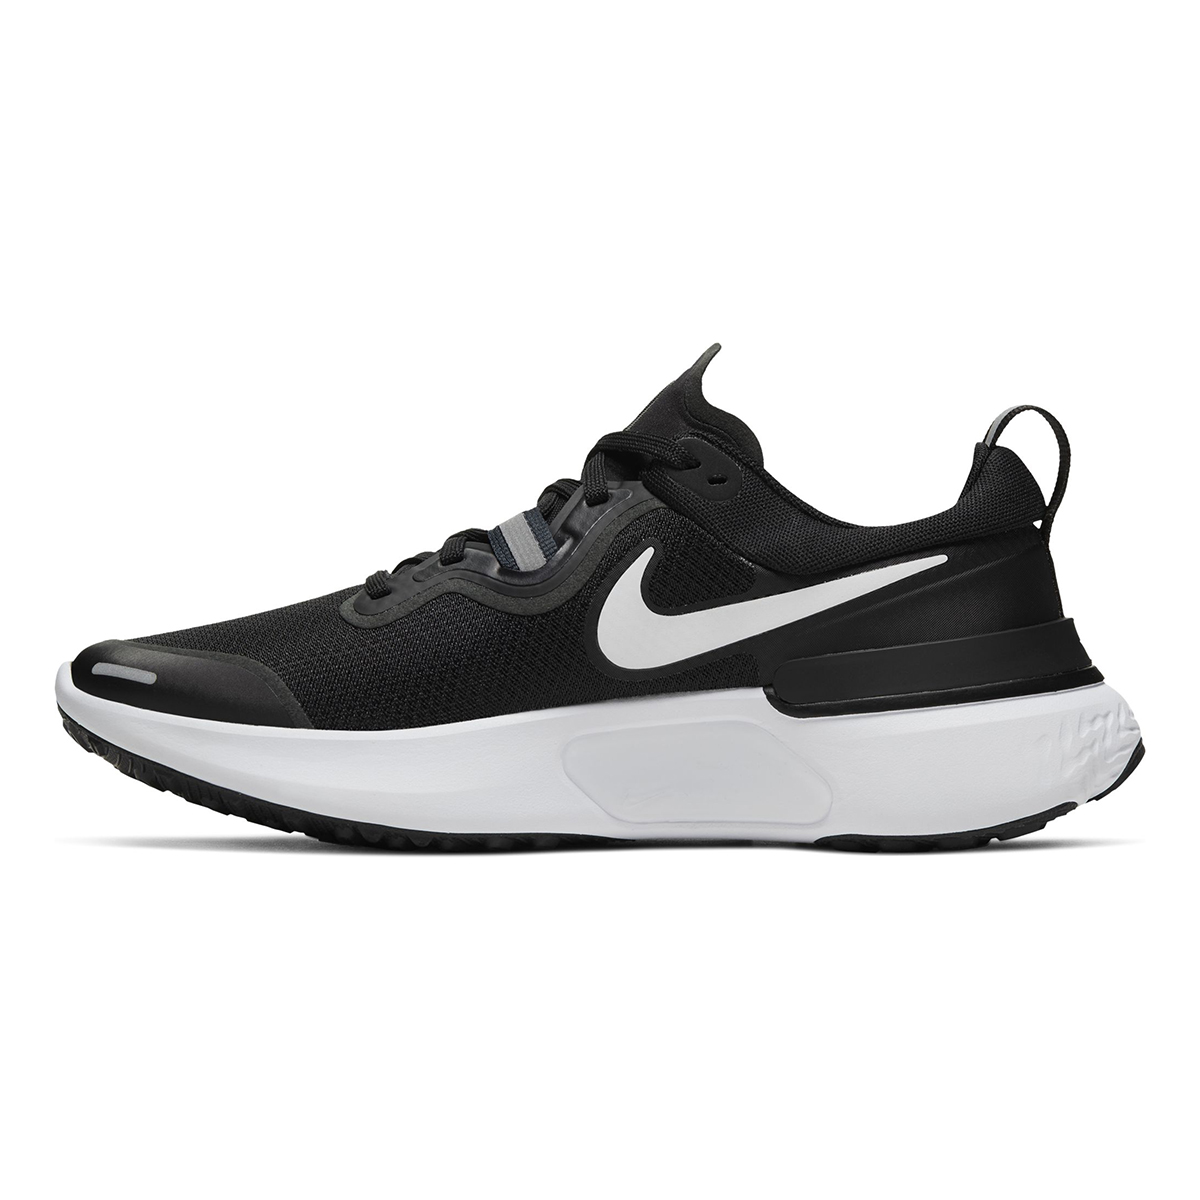 Women's Nike React Miler Running Shoe - Color: Black/Dark Grey/Anthracite/White (Regular Width) - Size: 5, Black/Dark Grey/Anthracite/White, large, image 2